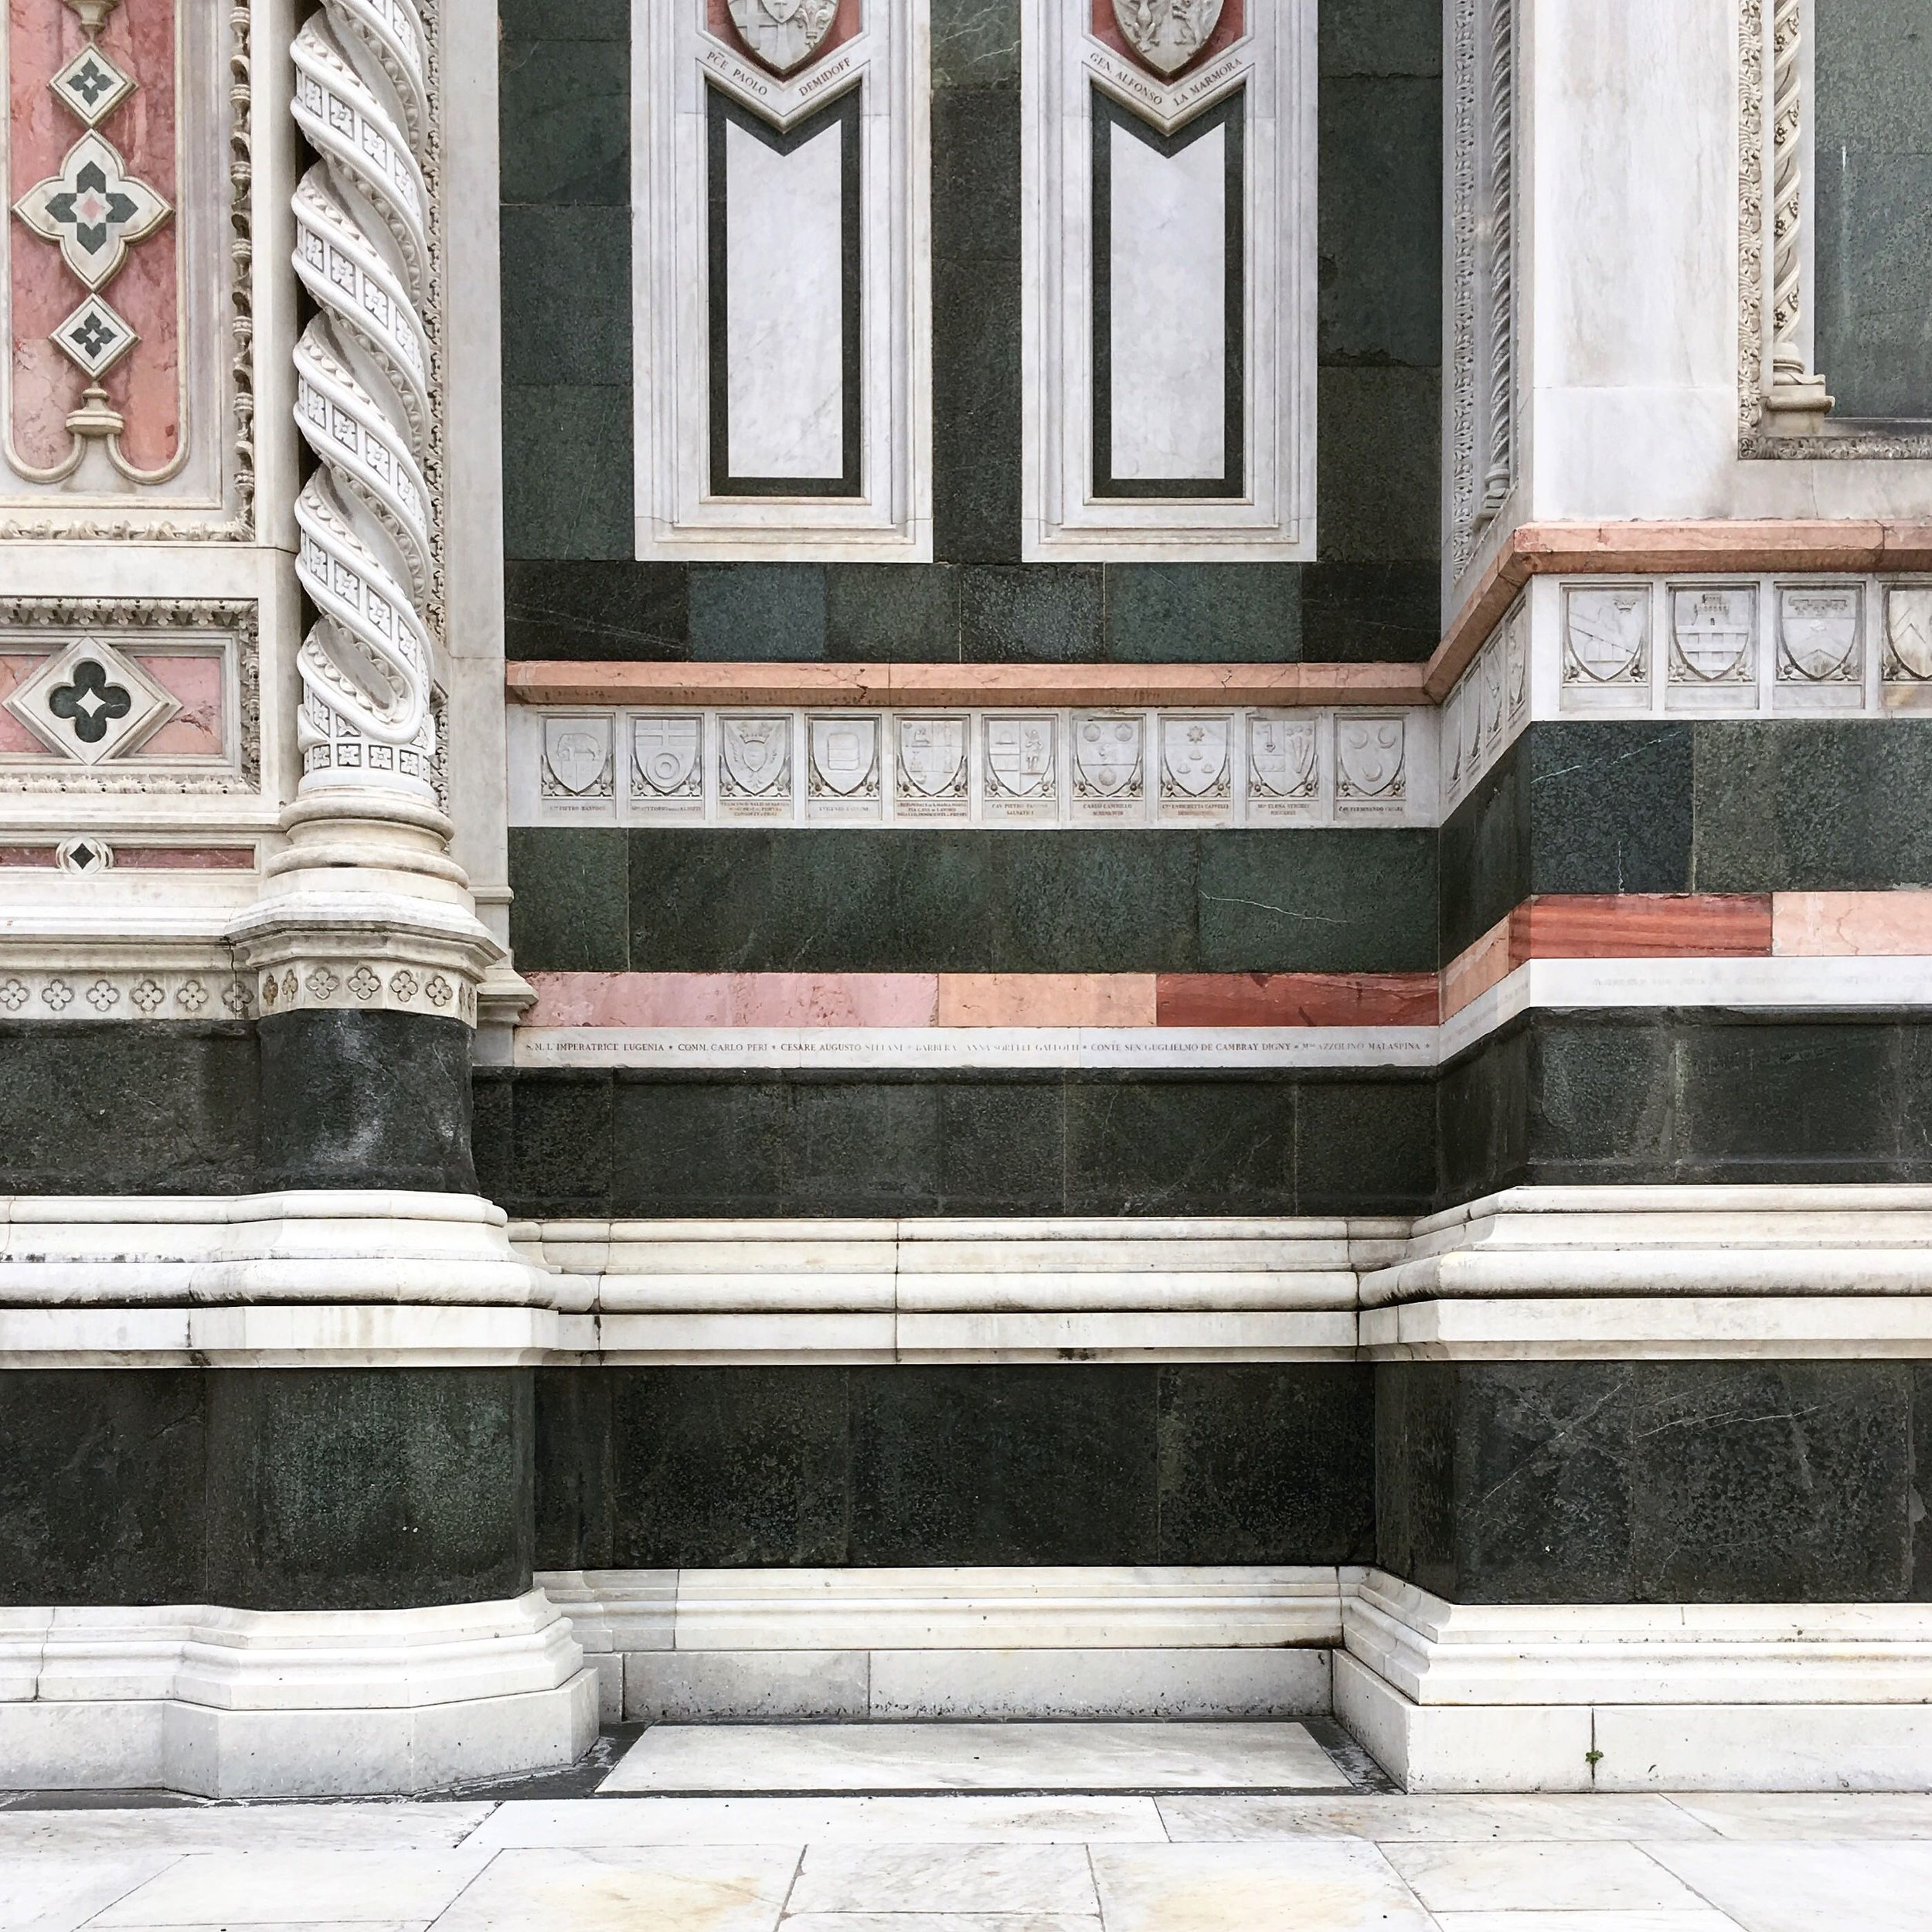 Lozidaze_Duomo_04